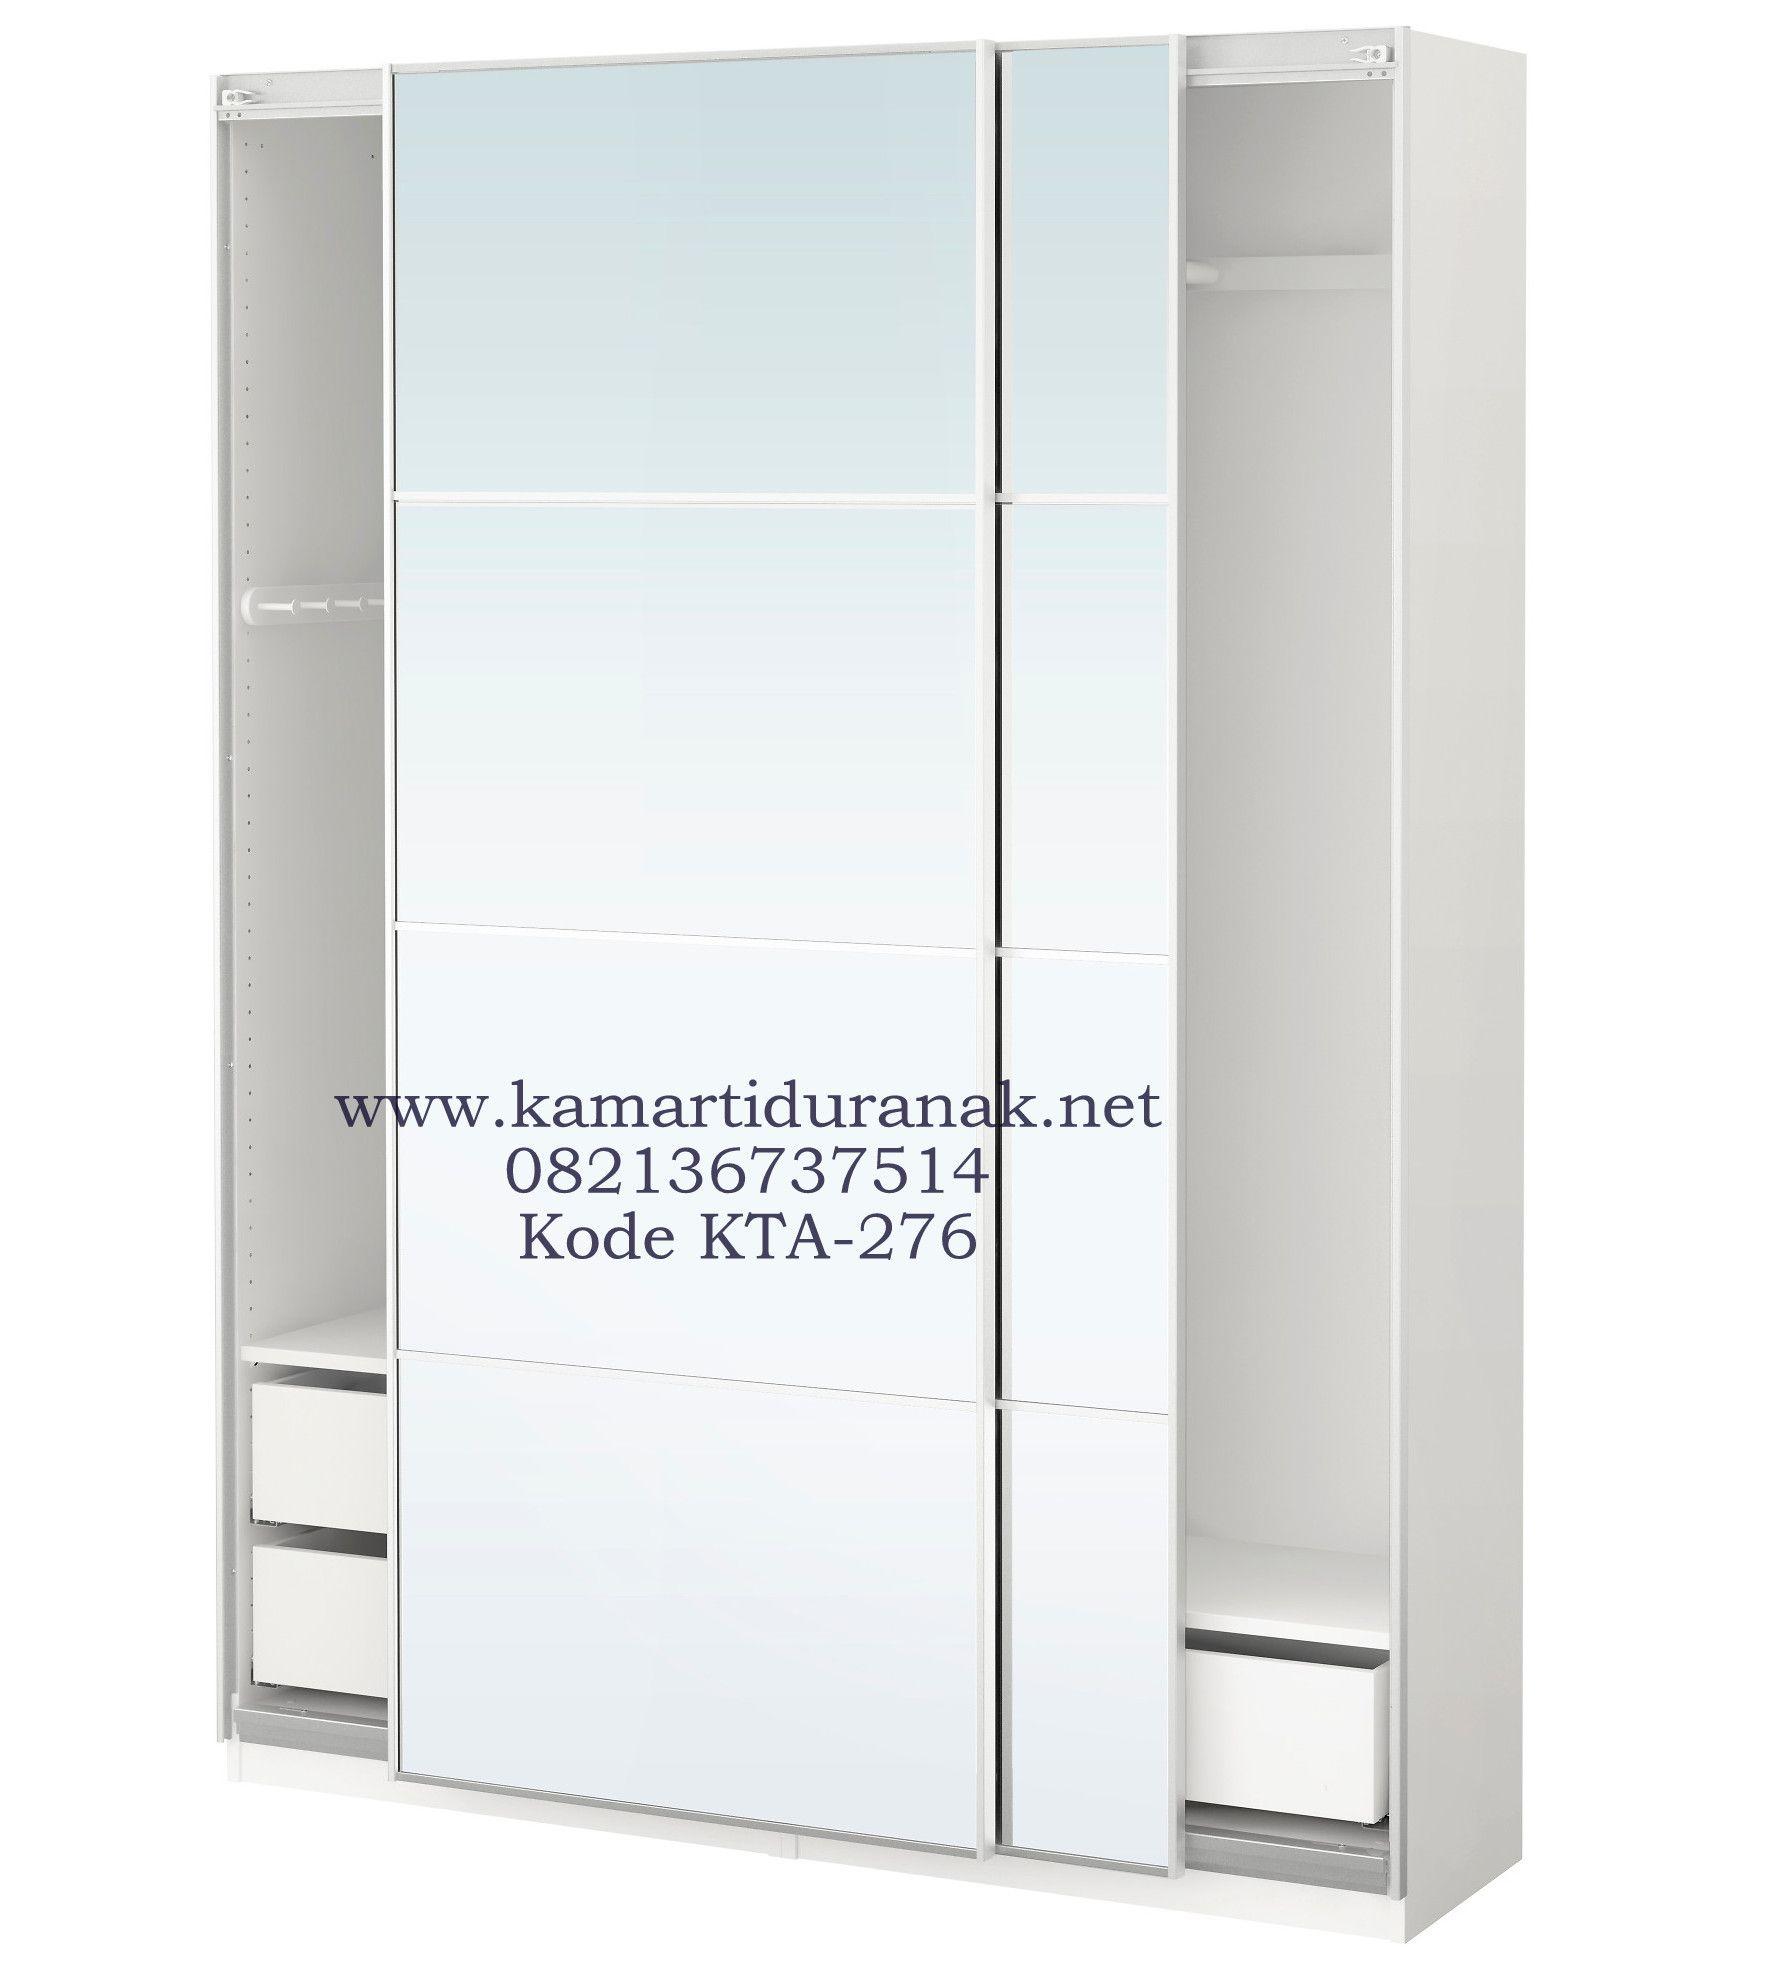 Jual Lemari Anak Pintu Sliding Minimalis 2 Doors Modern, Lemari ...